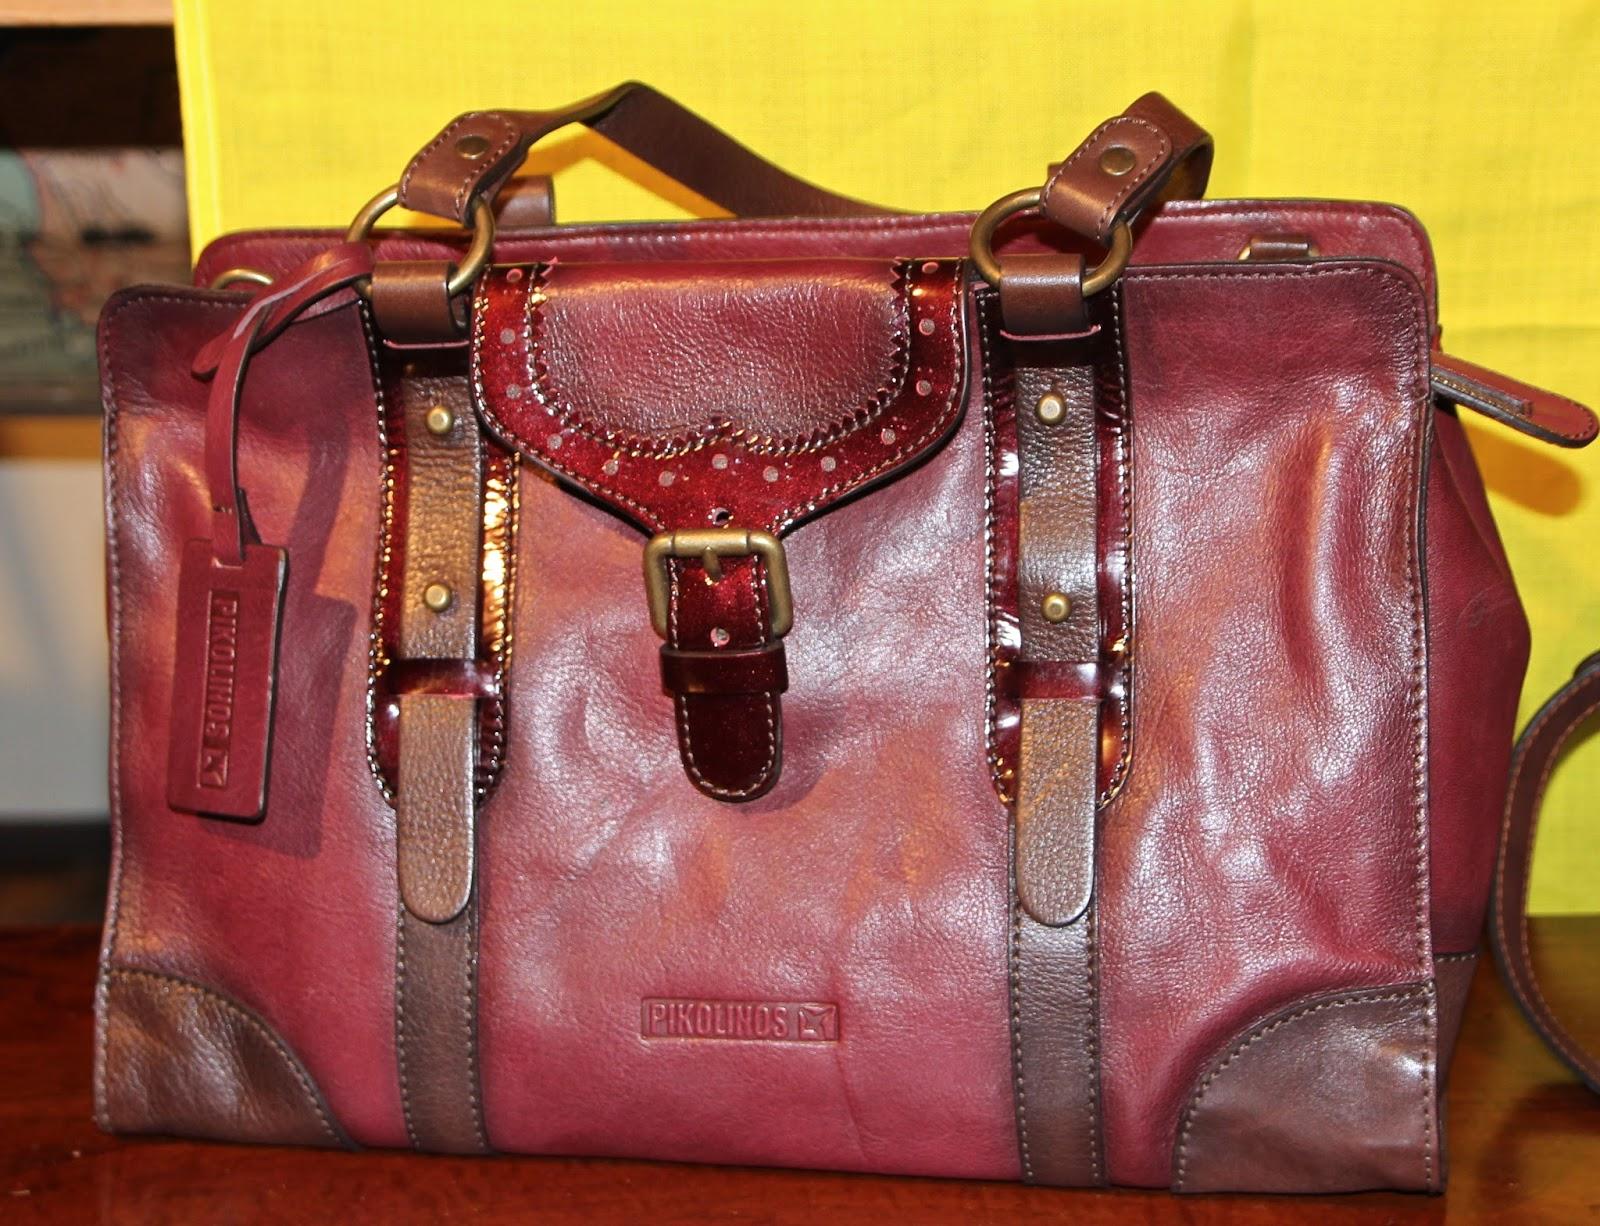 ce6b65a6c6d PIKOLINOS Leather-Satchels, Backpacks, Handbags